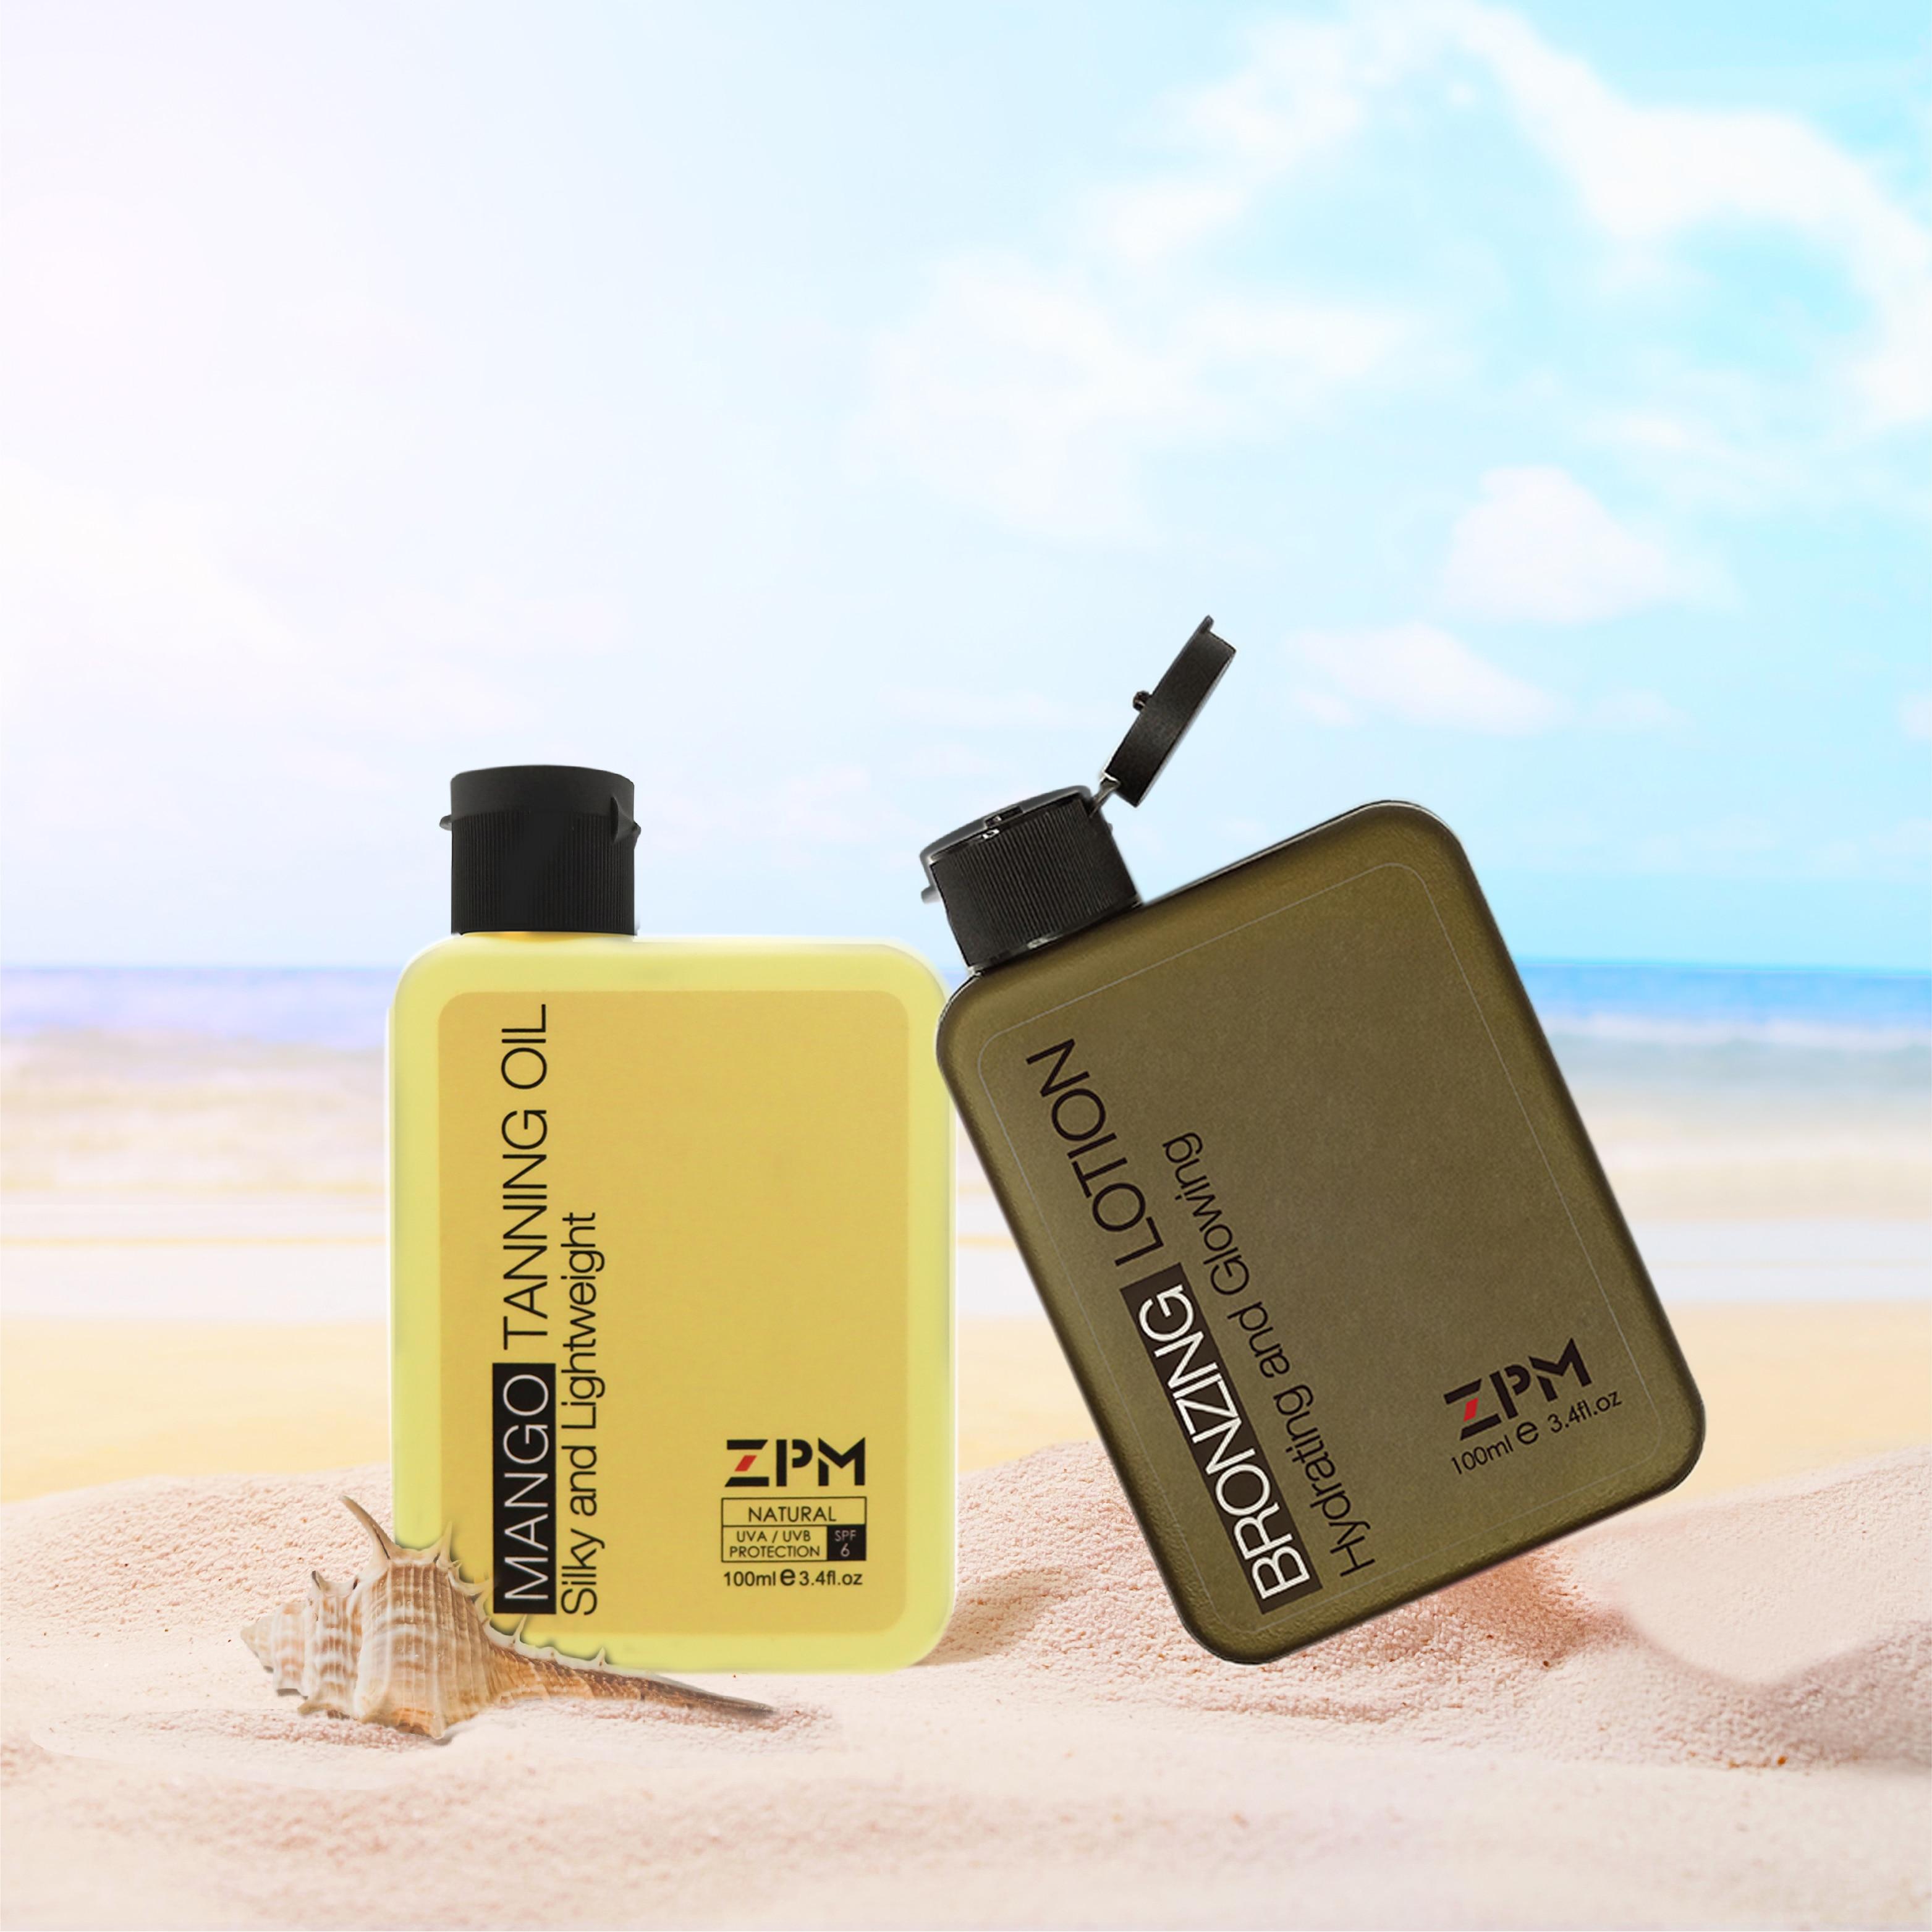 ZPM Mango Tanning Oil+bronzing Lotion SPF 6 Broad Spectrum Coconut Oil,Vintam E Hypoallergenic 3.4oz./100mlx2